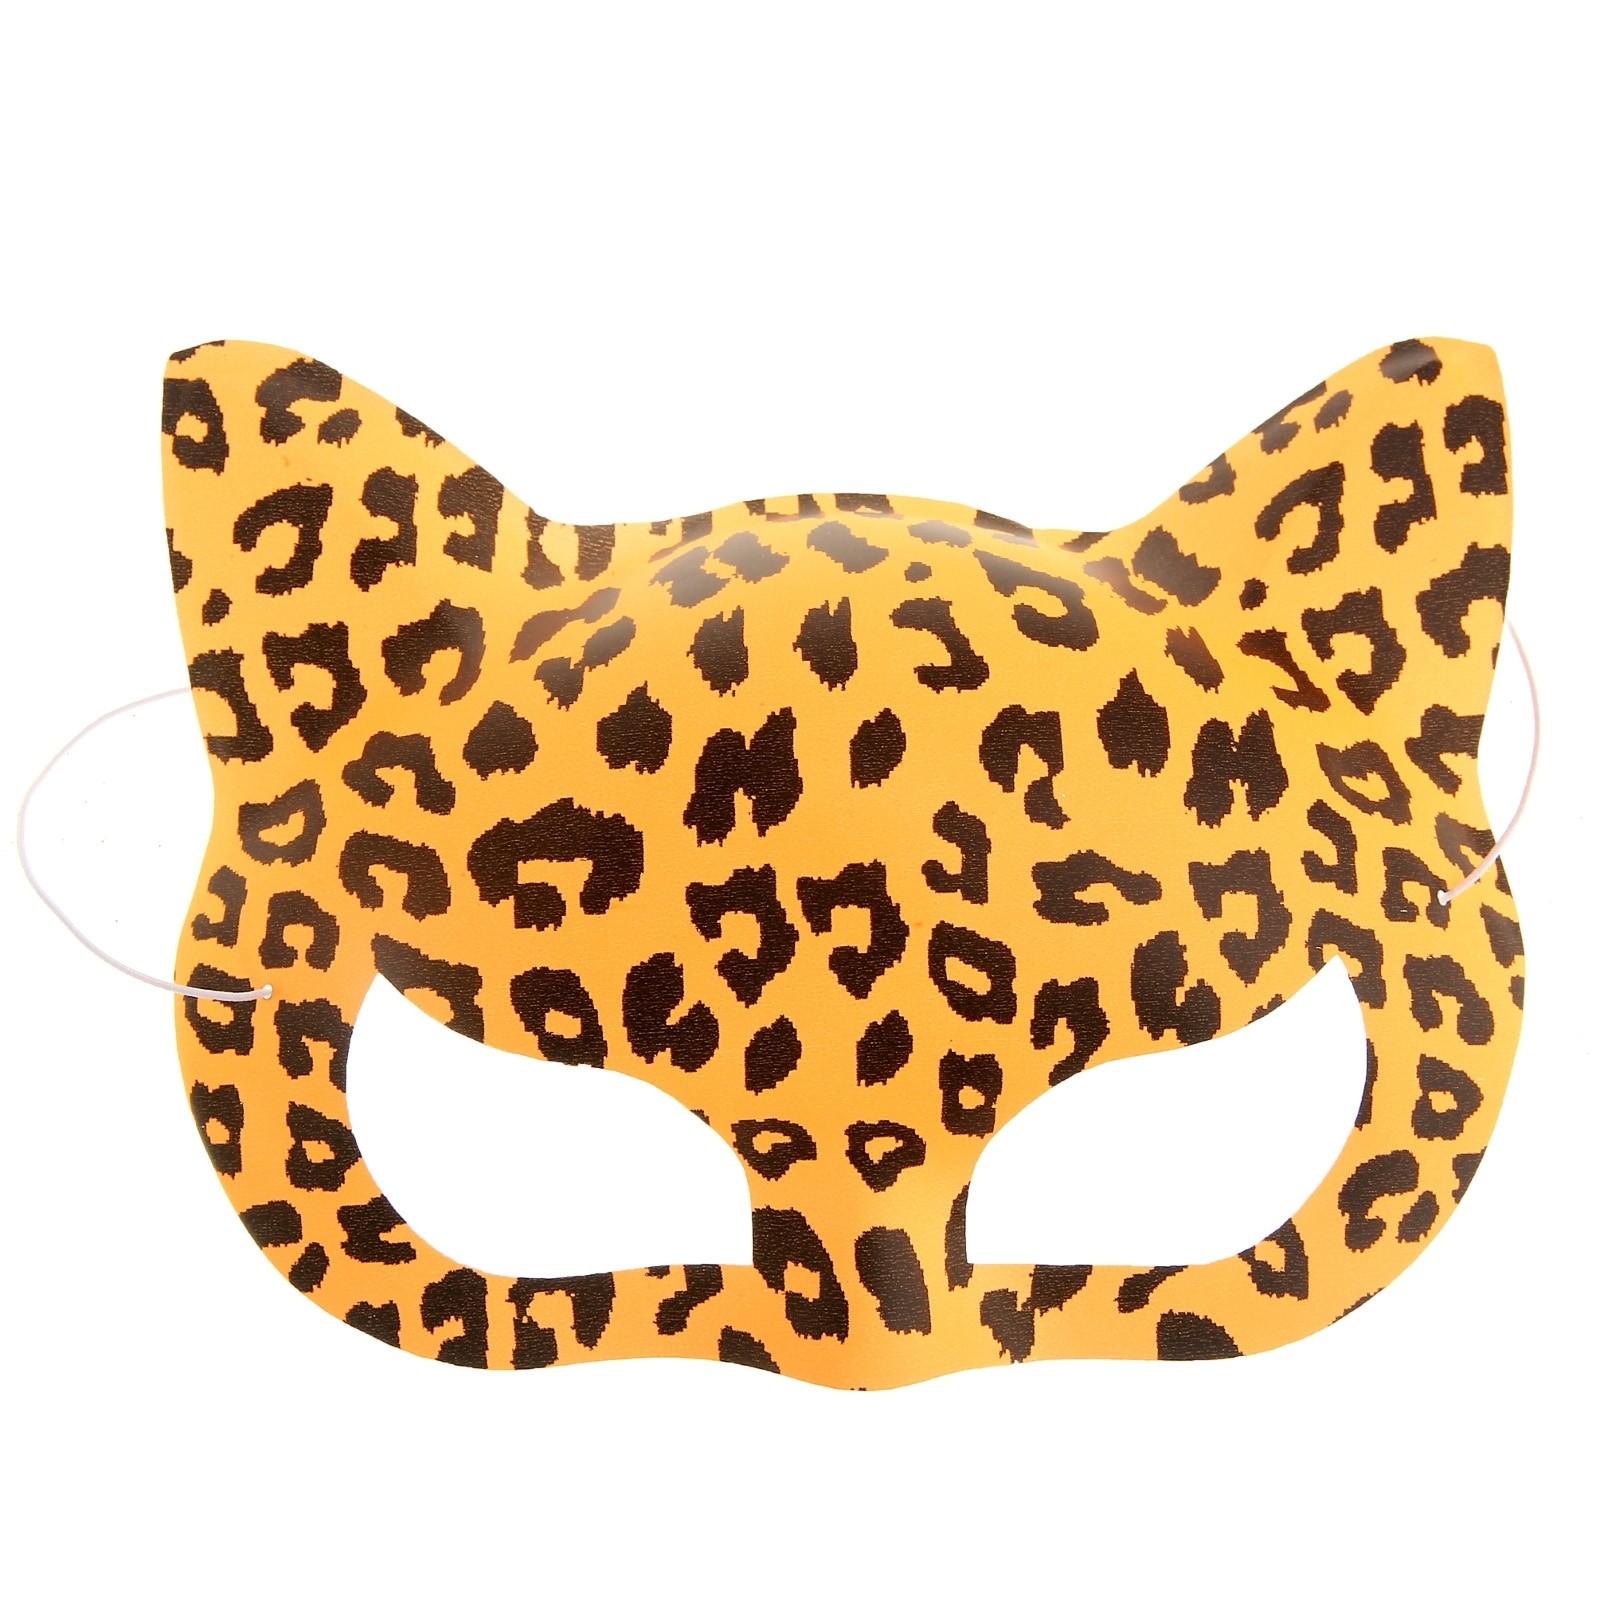 Набор масок Леопард 6шт (UNI) набор бокалов crystalex ангела оптика отводка зол 6шт 400мл бренди стекло